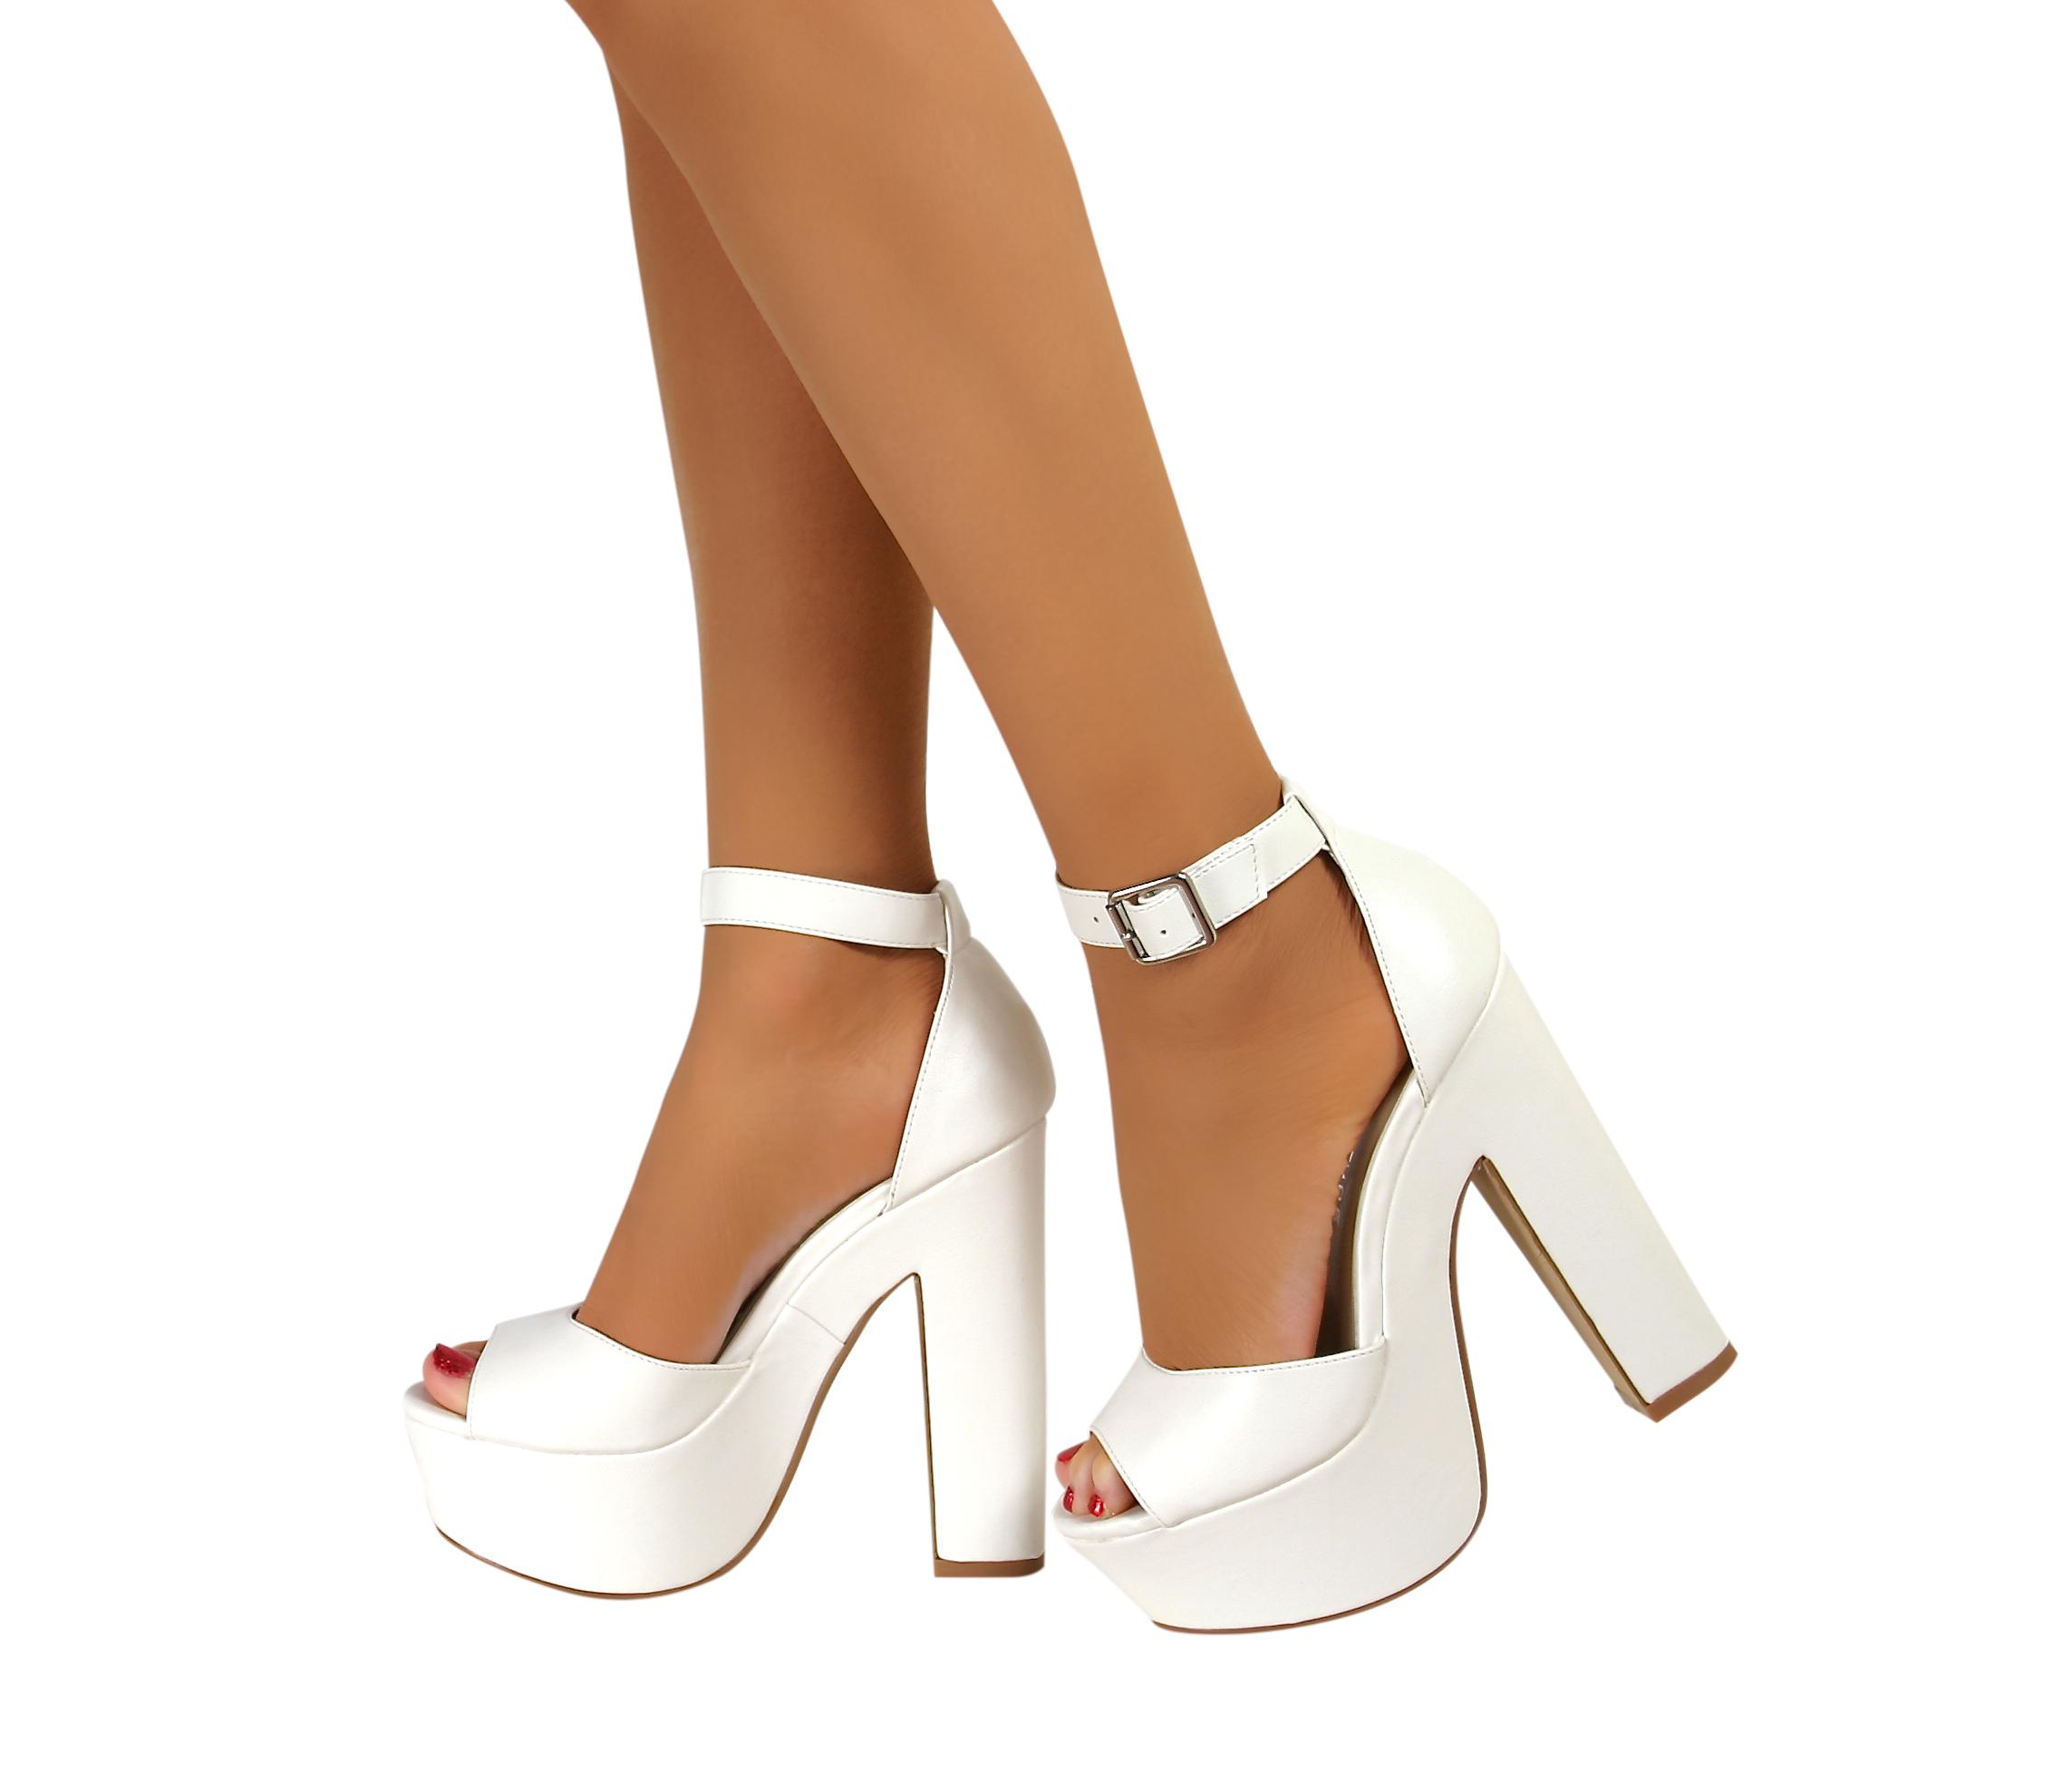 ladies womens ankle strap platform chunky high heel. Black Bedroom Furniture Sets. Home Design Ideas